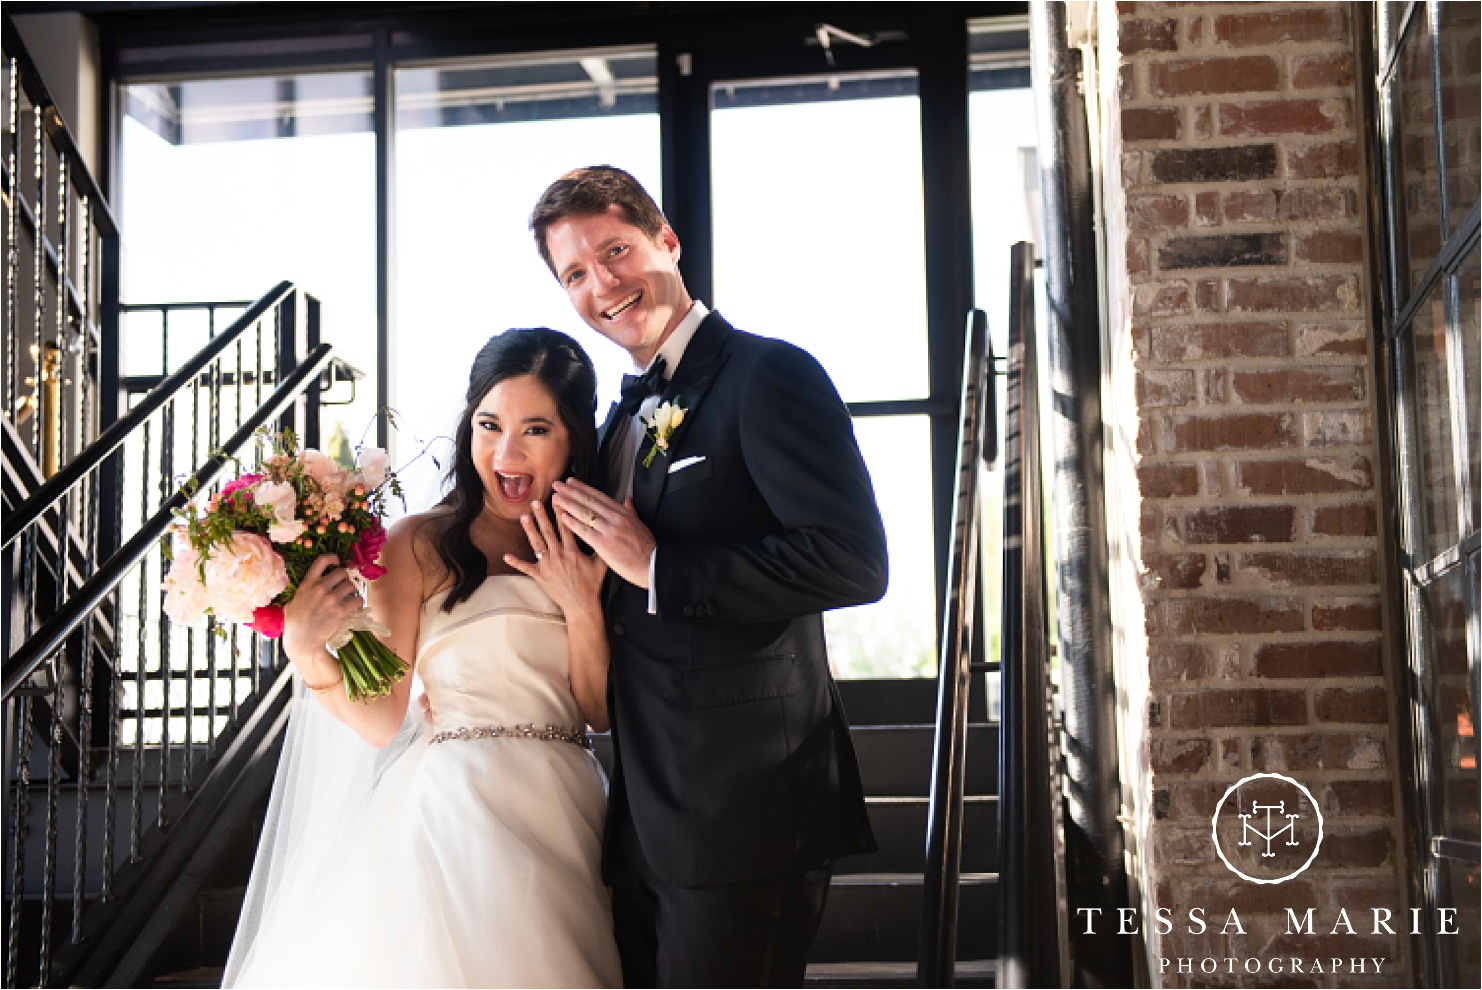 Tessa_marie_weddings_houston_wedding_photographer_The_astorian_0126.jpg